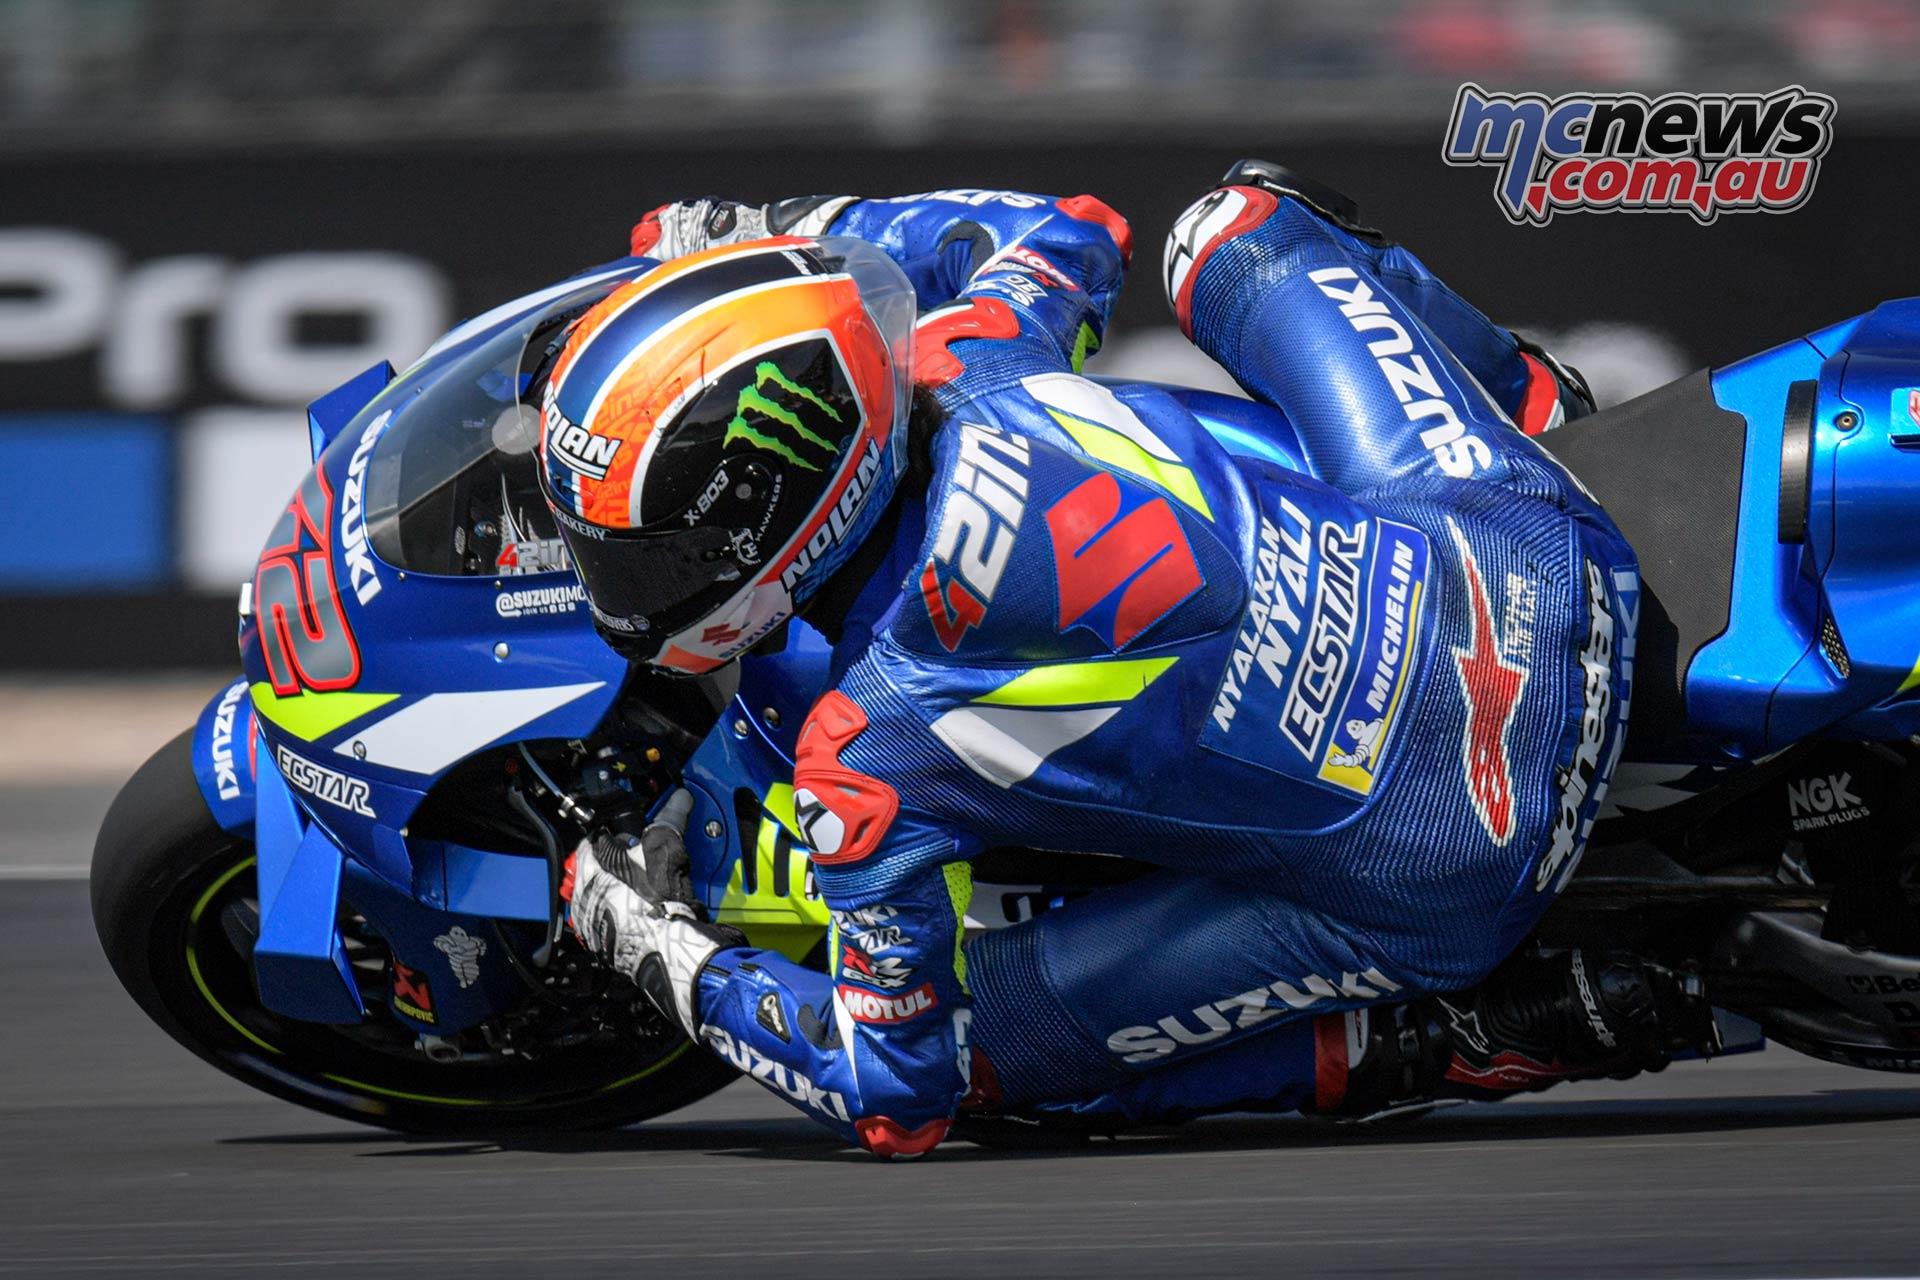 MotoGP Rnd Silverstone QP Rins